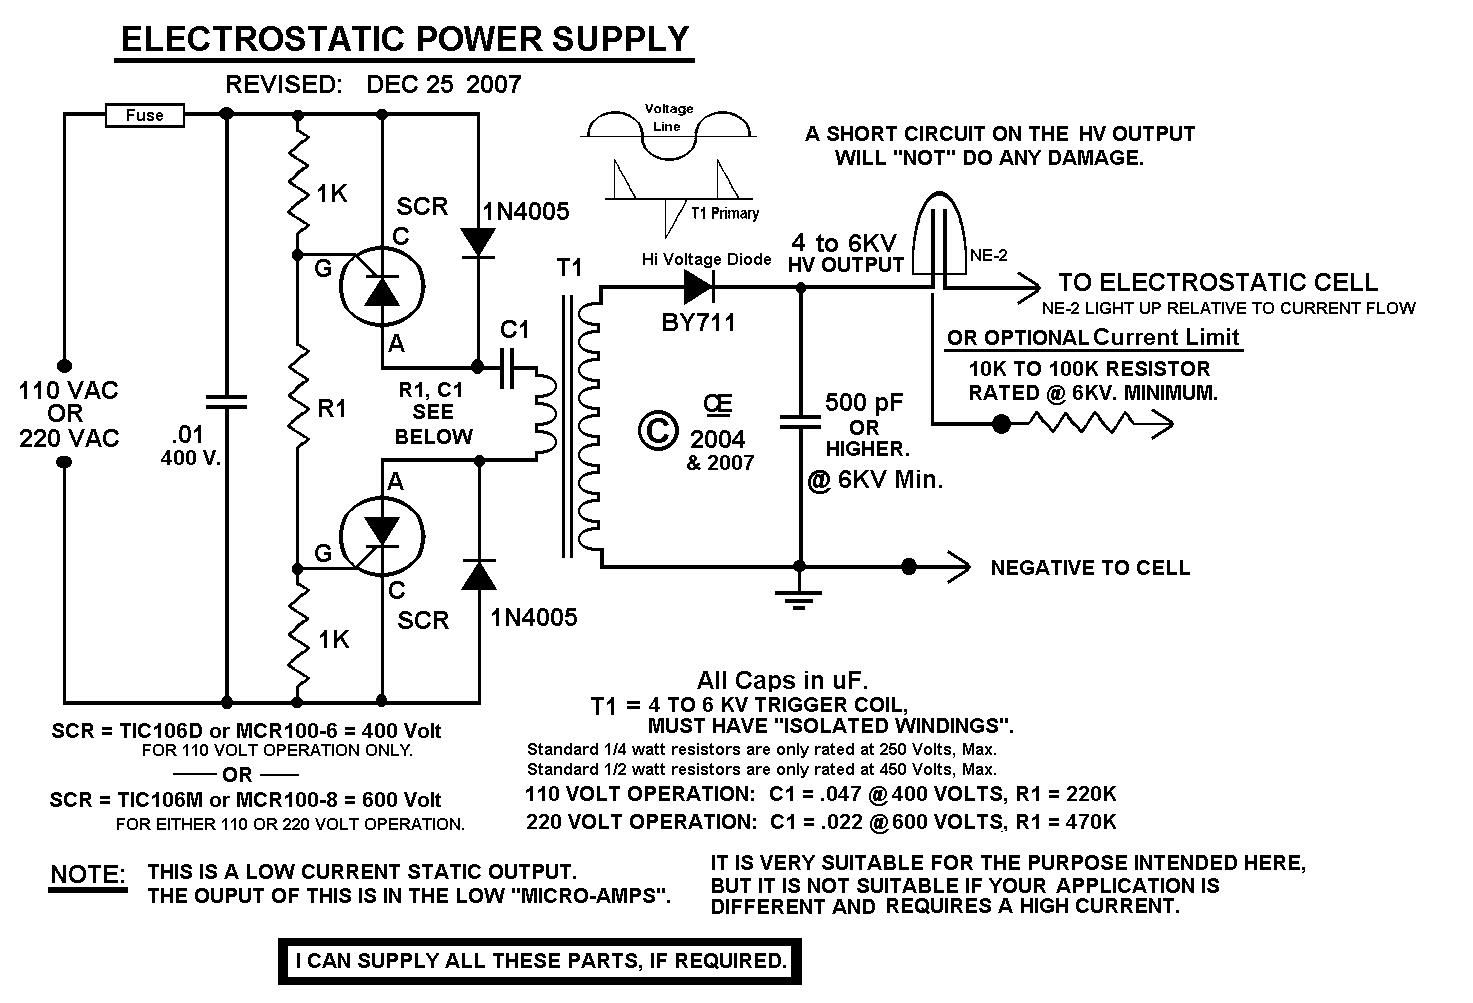 Gv 8761  Wiring Diagram For Air Purifier Free Diagram